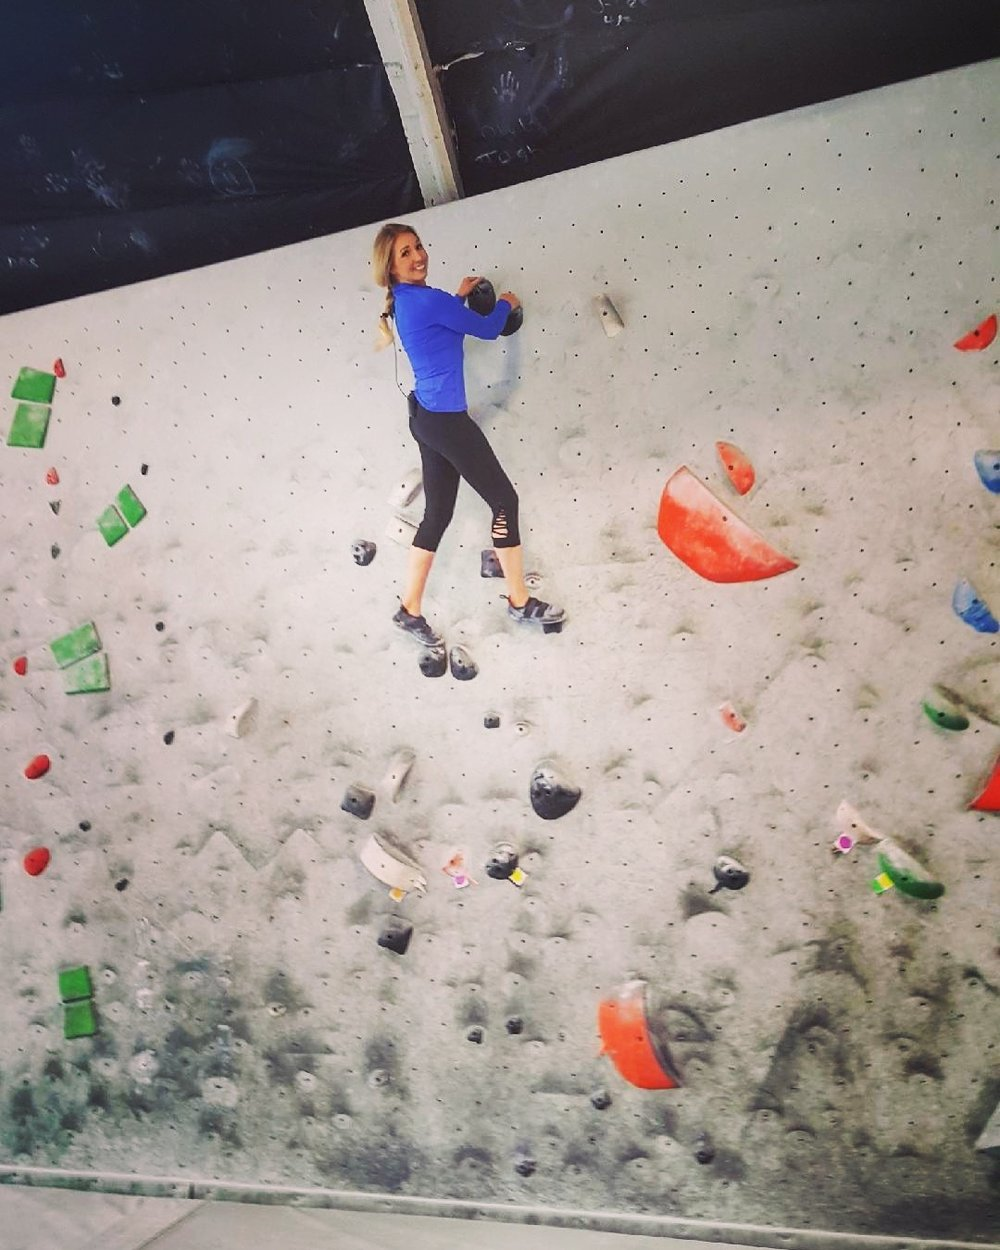 bouldering pic.jpg